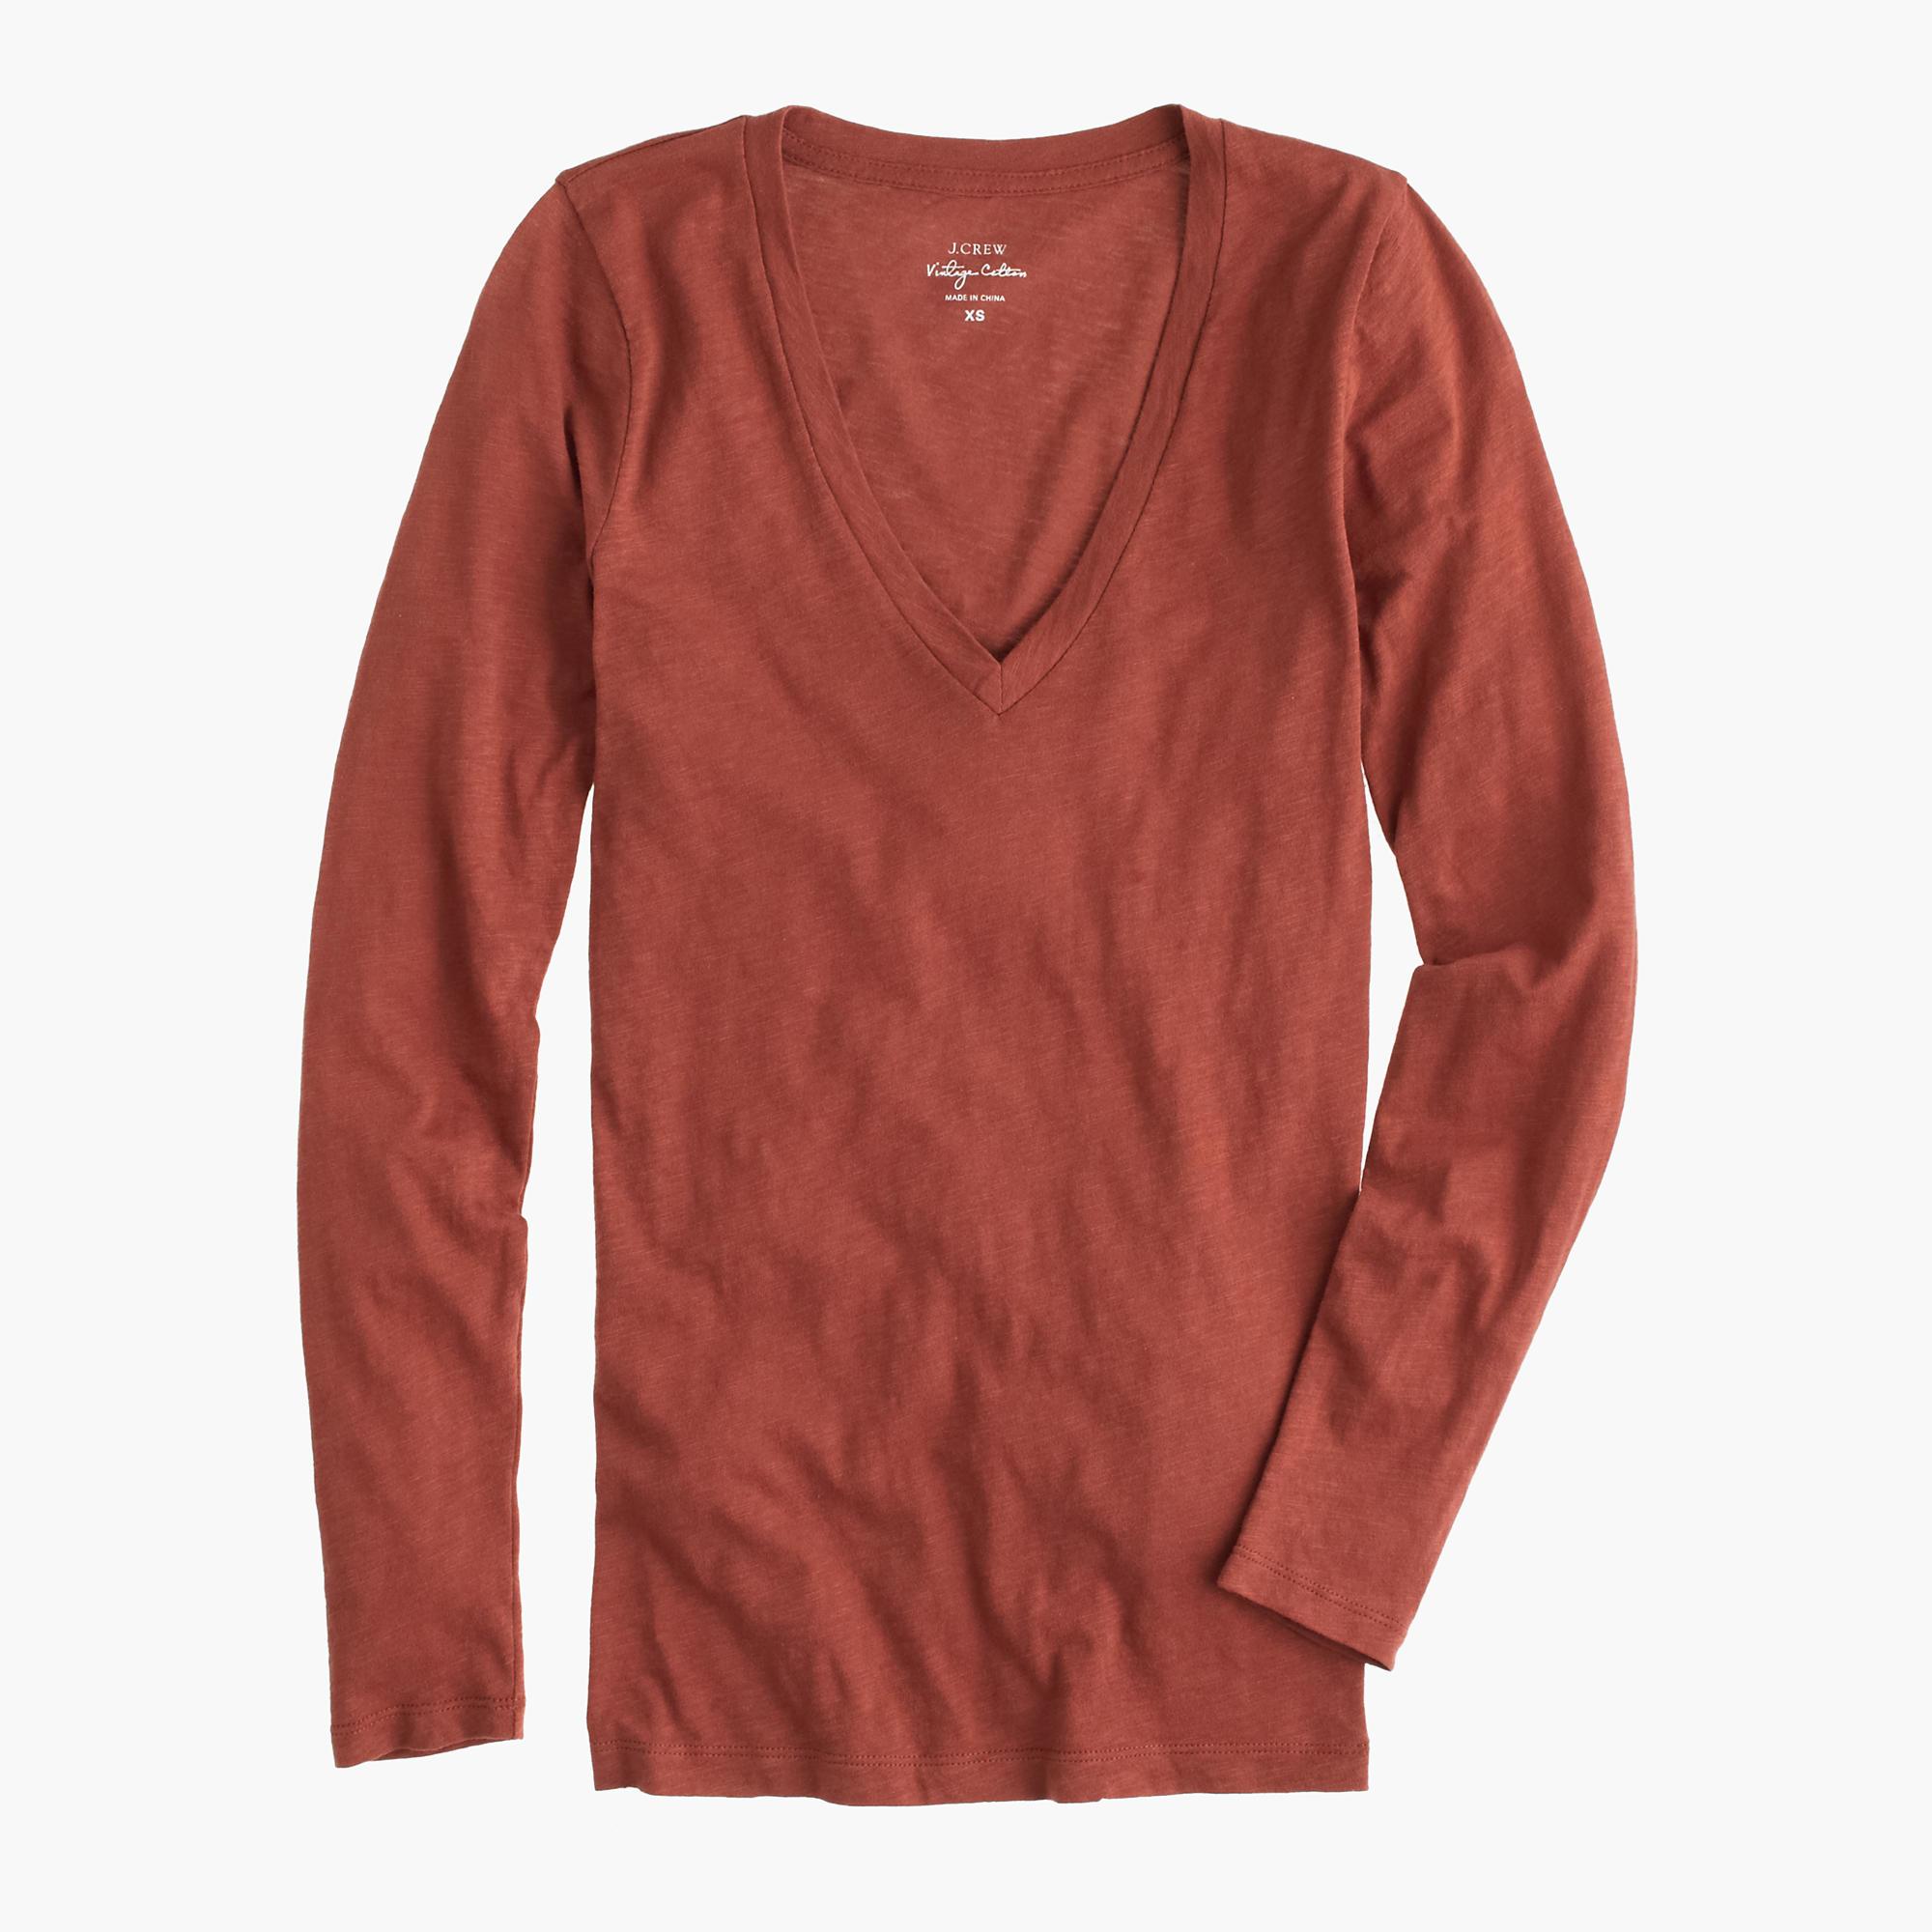 Vintage cotton long sleeve v neck t shirt in red for Cotton long sleeve v neck t shirts